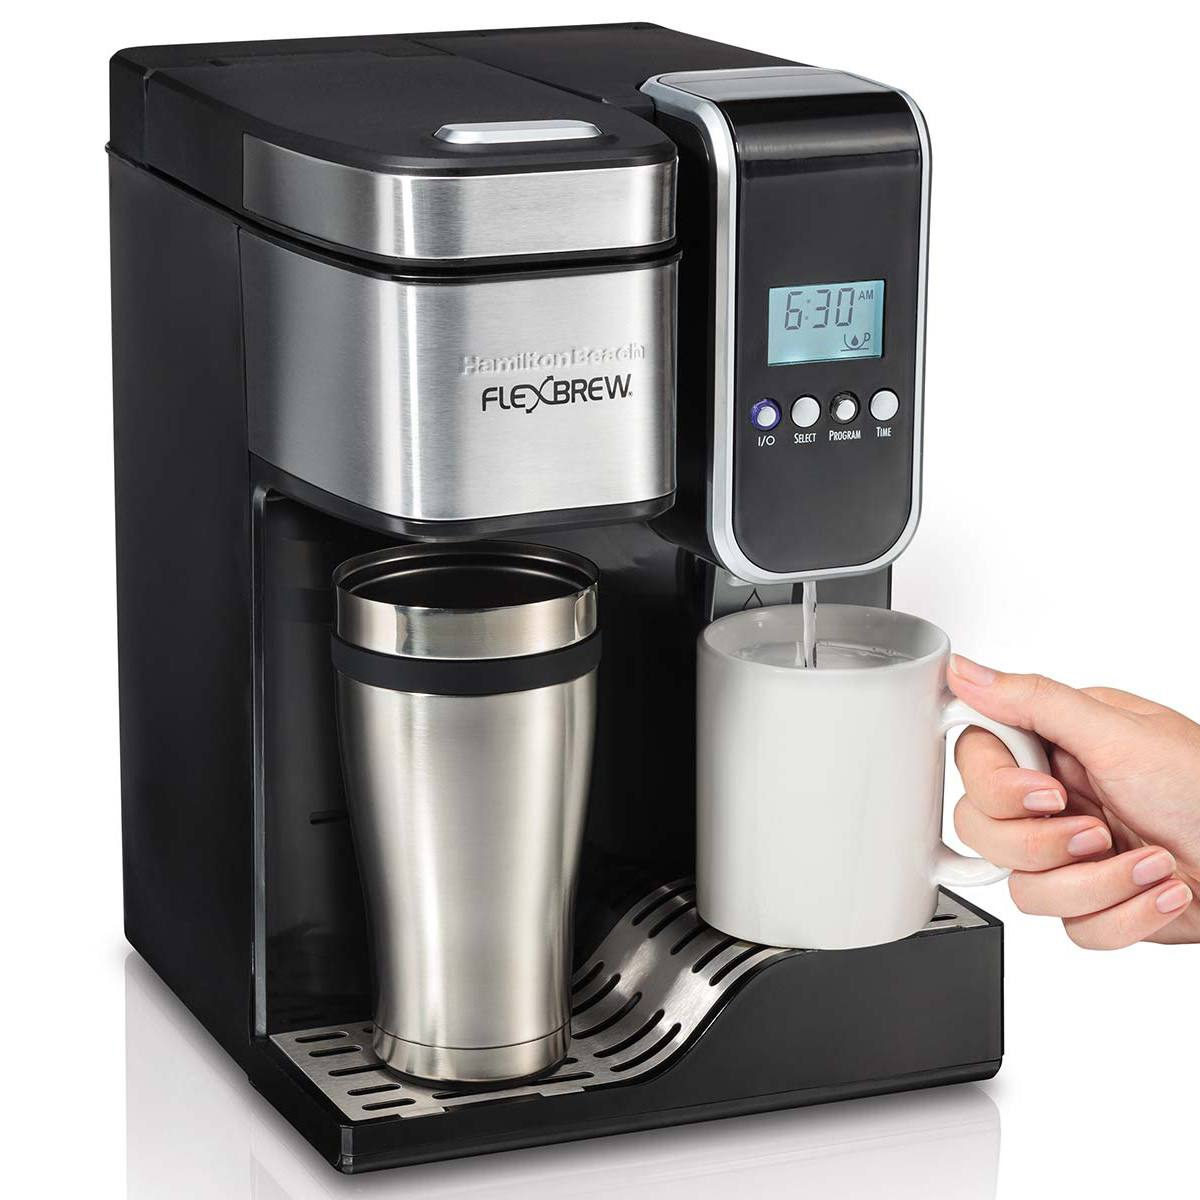 Hamiltonbeachca Flexbrew Programmable Single Serve Coffee